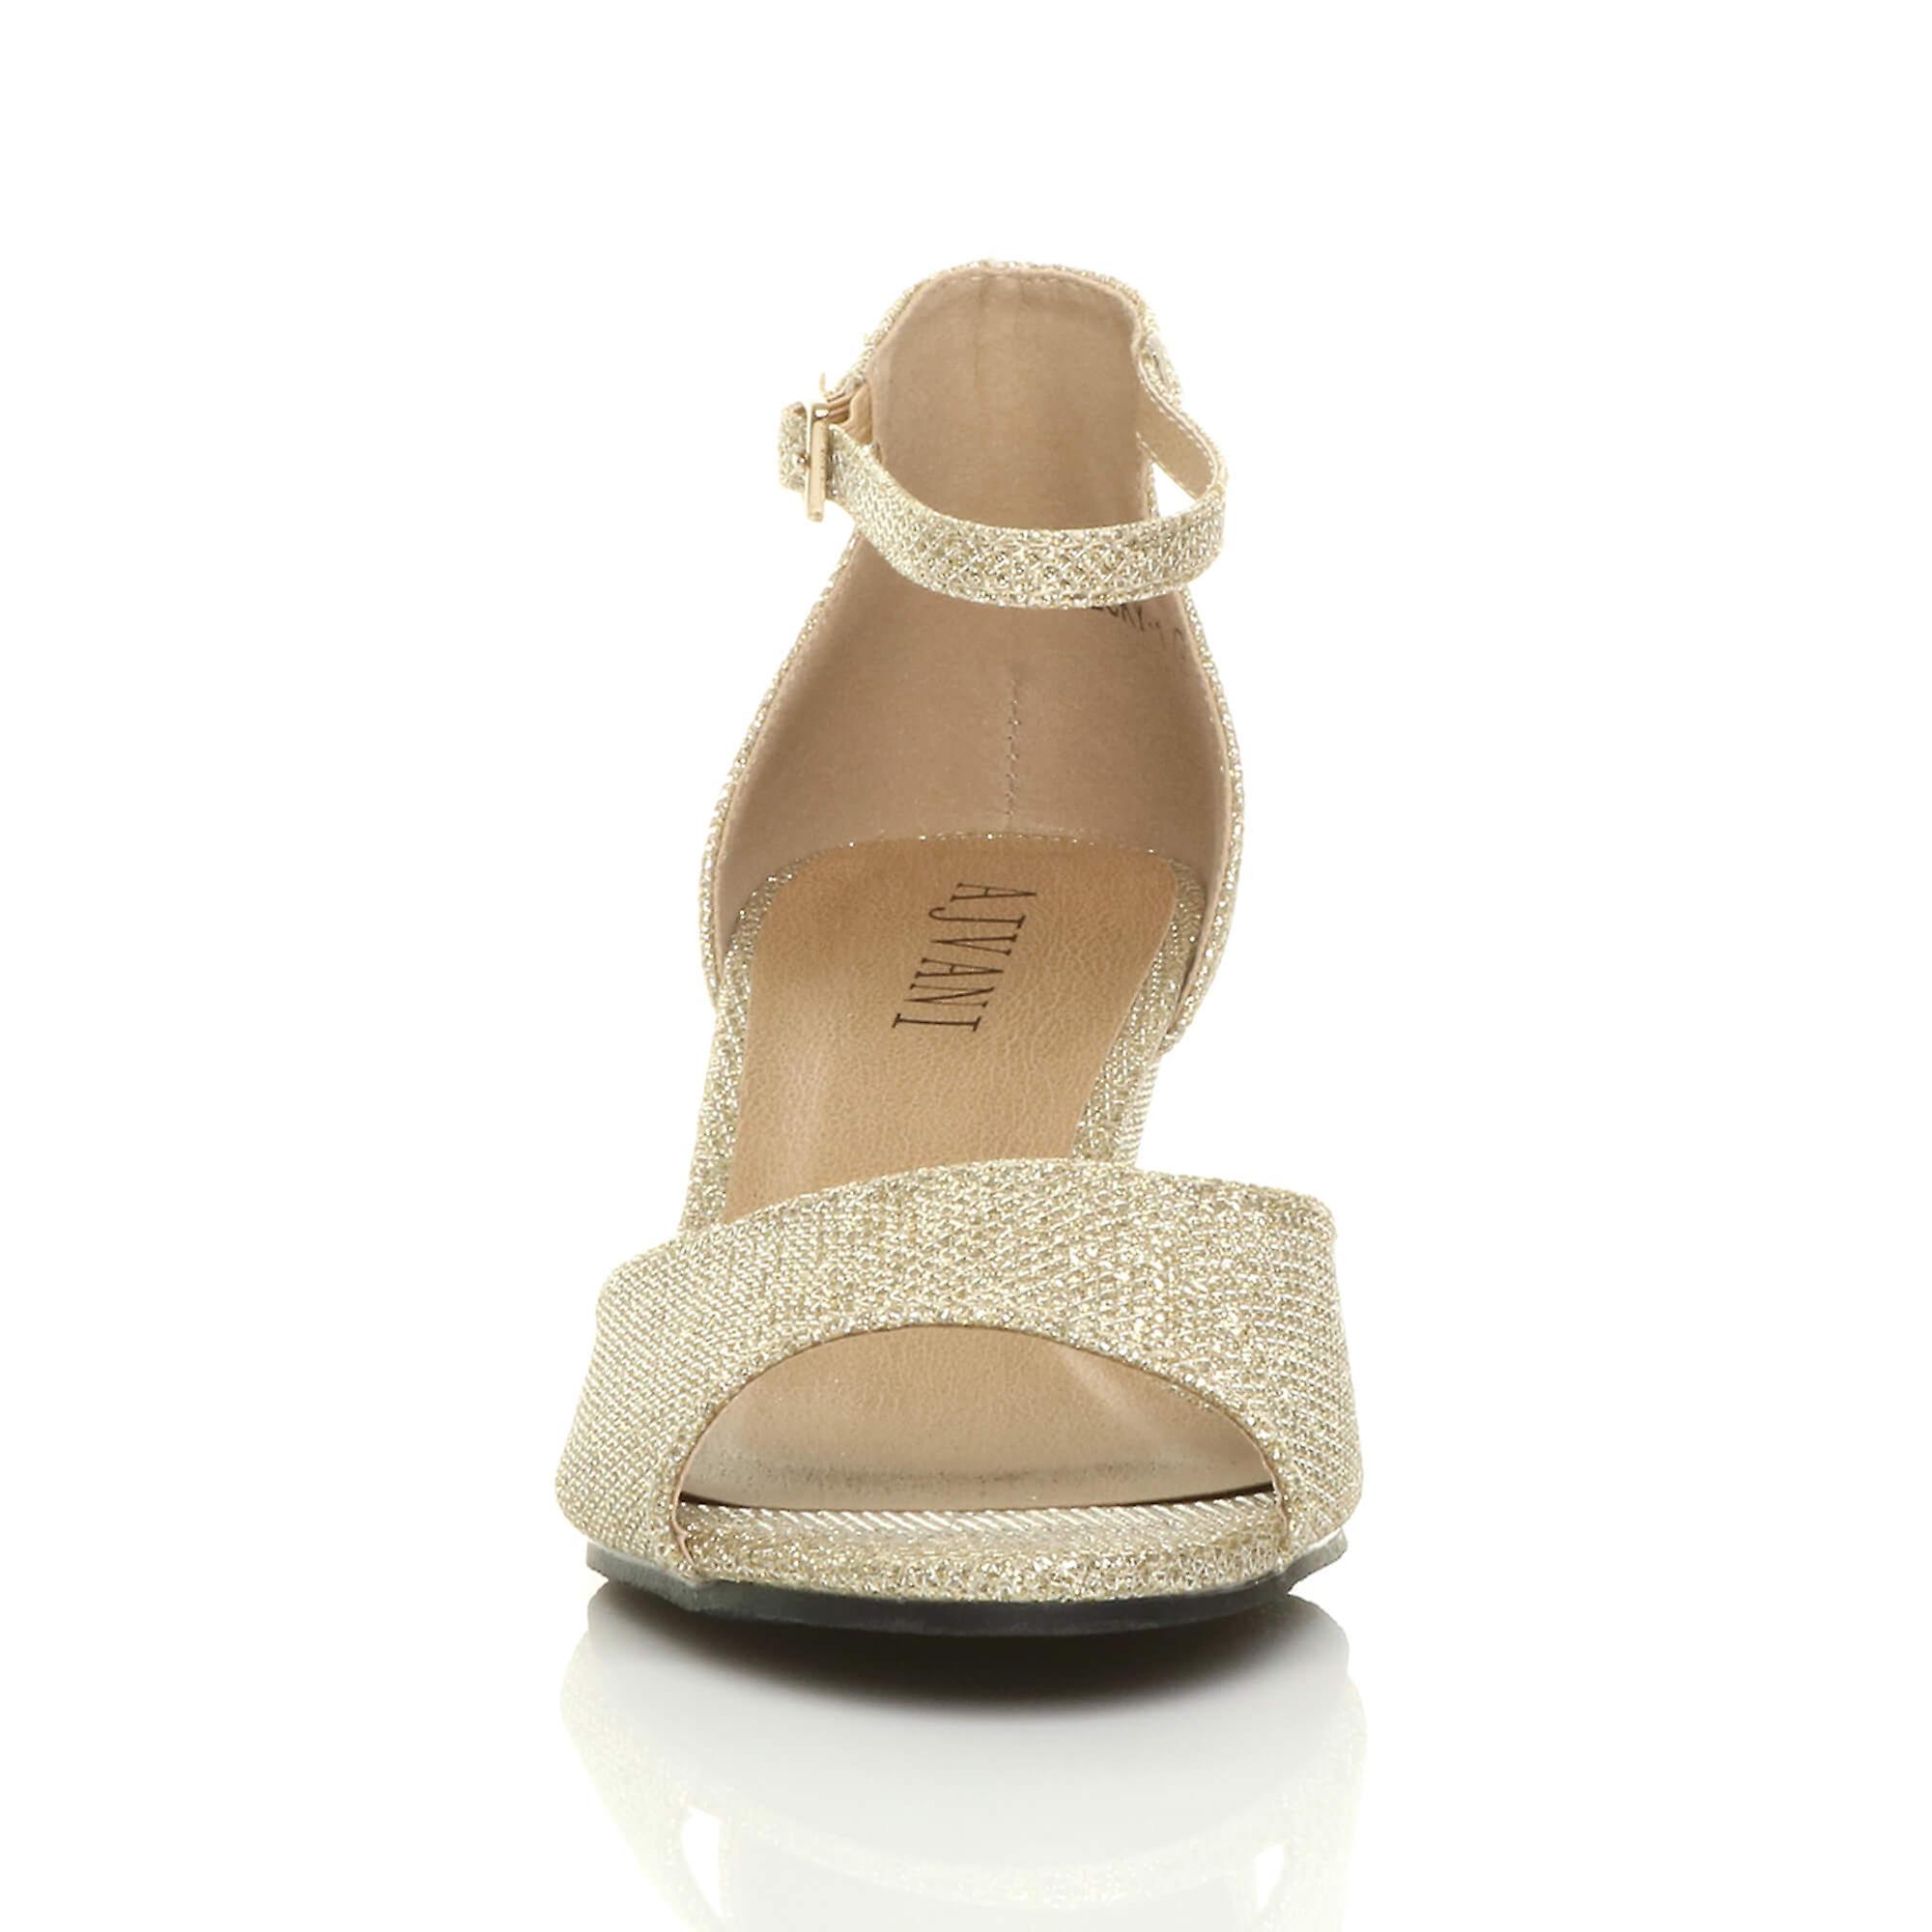 Womens Ajvani bas mi sandales compensées talon peep toe cheville sangle soir casual smart